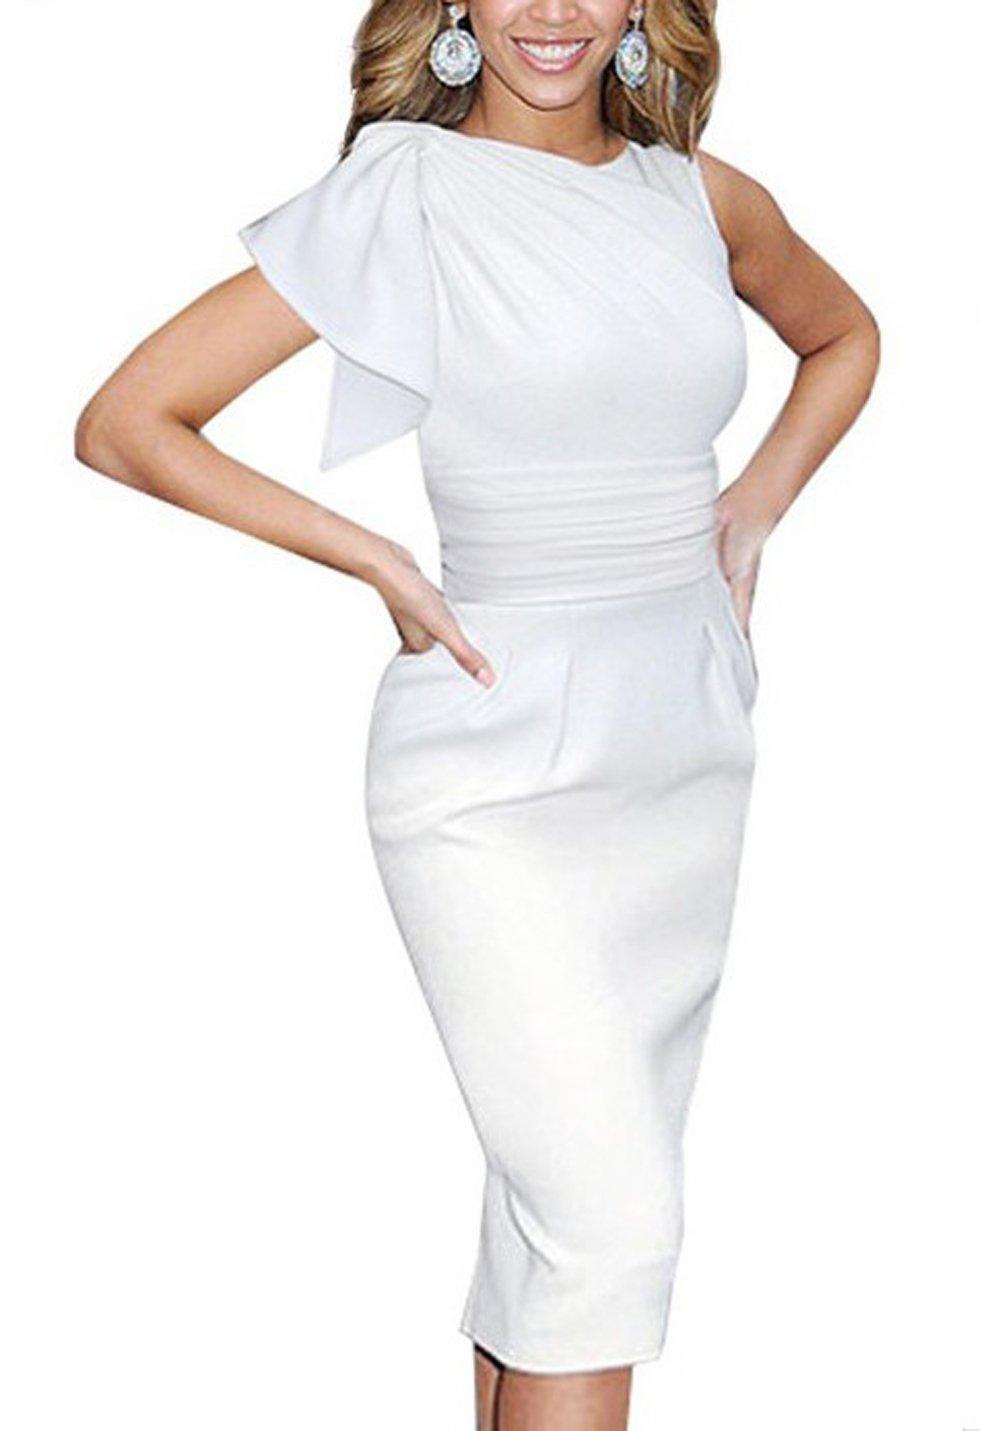 HELYO Women's Elegant Vintage 1950s Style Wear to Work Asymmetrical Sleeves Office Bodycon Pencil Dress Knees Length 061 (XXL, White)